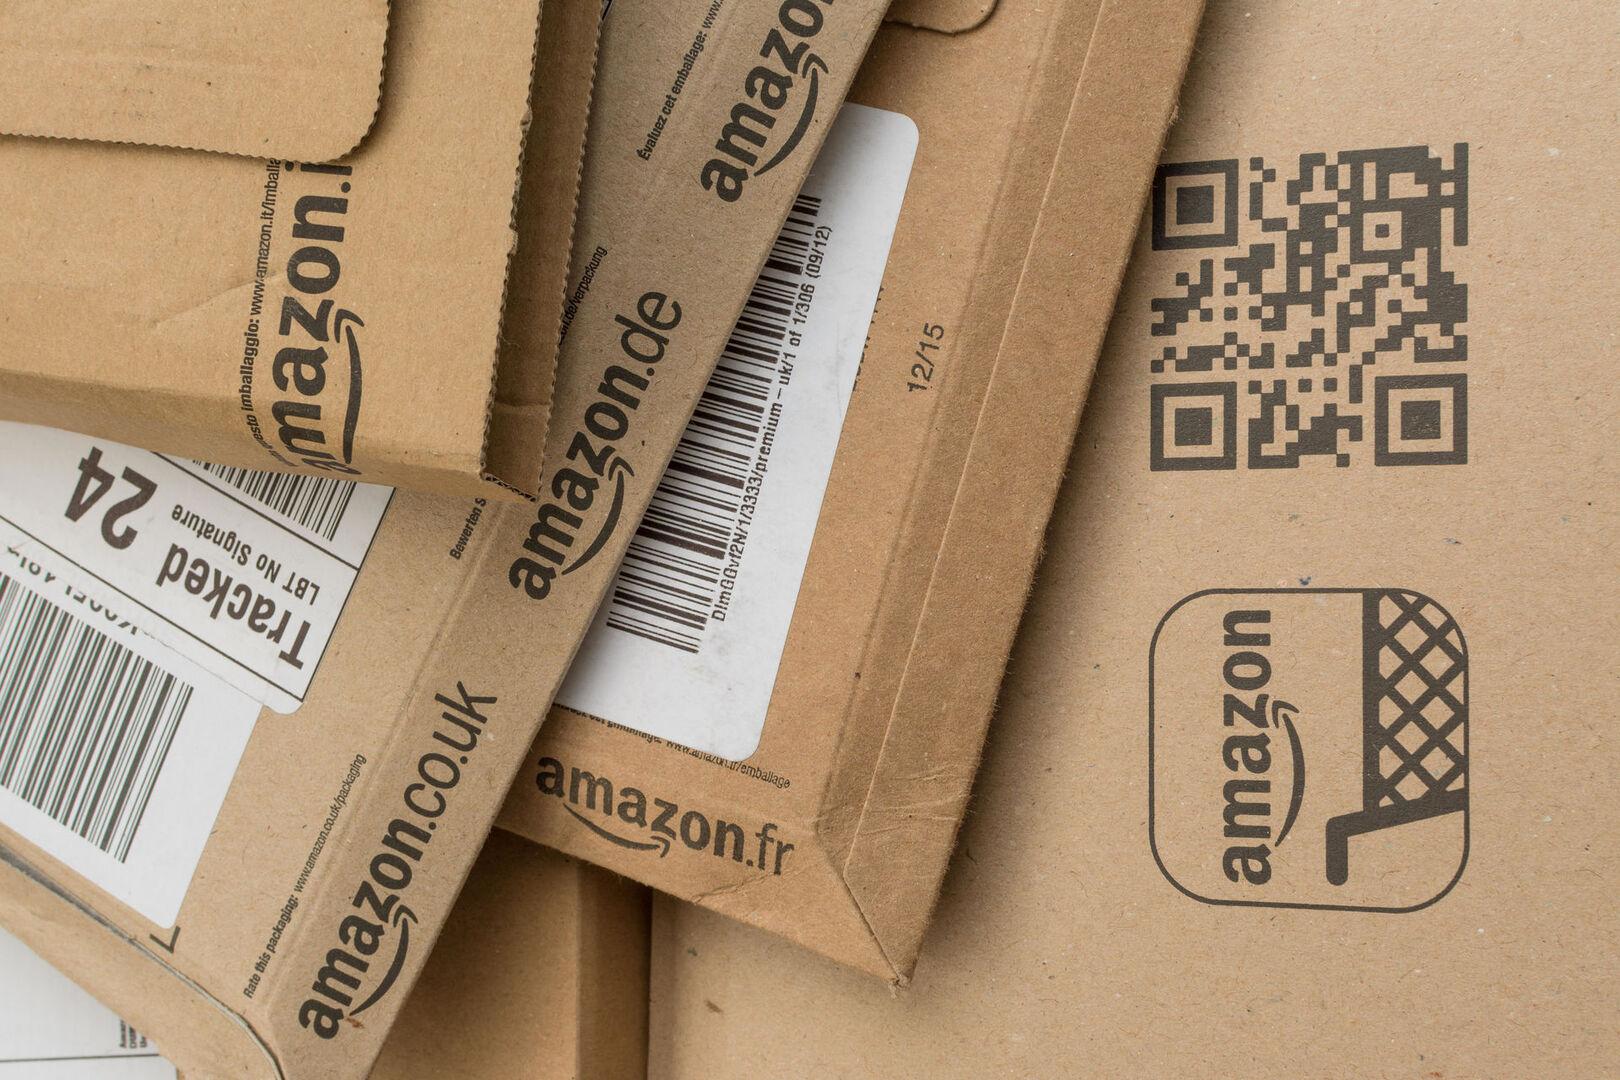 Amazon lanza un servicio de envíos con tarifa plana para empresas